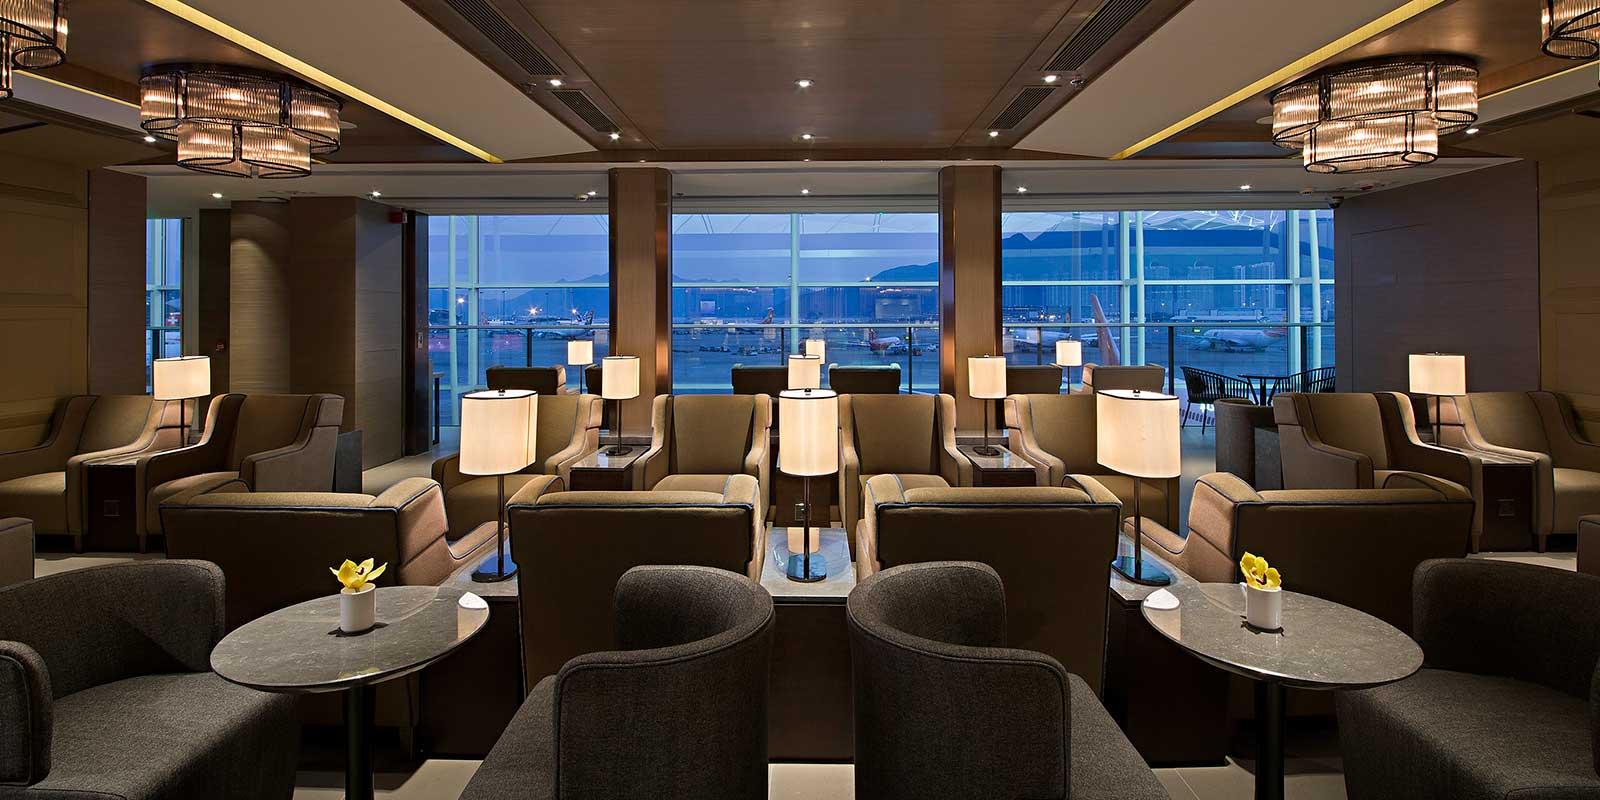 Photo Credit: Plaza Premium Lounge